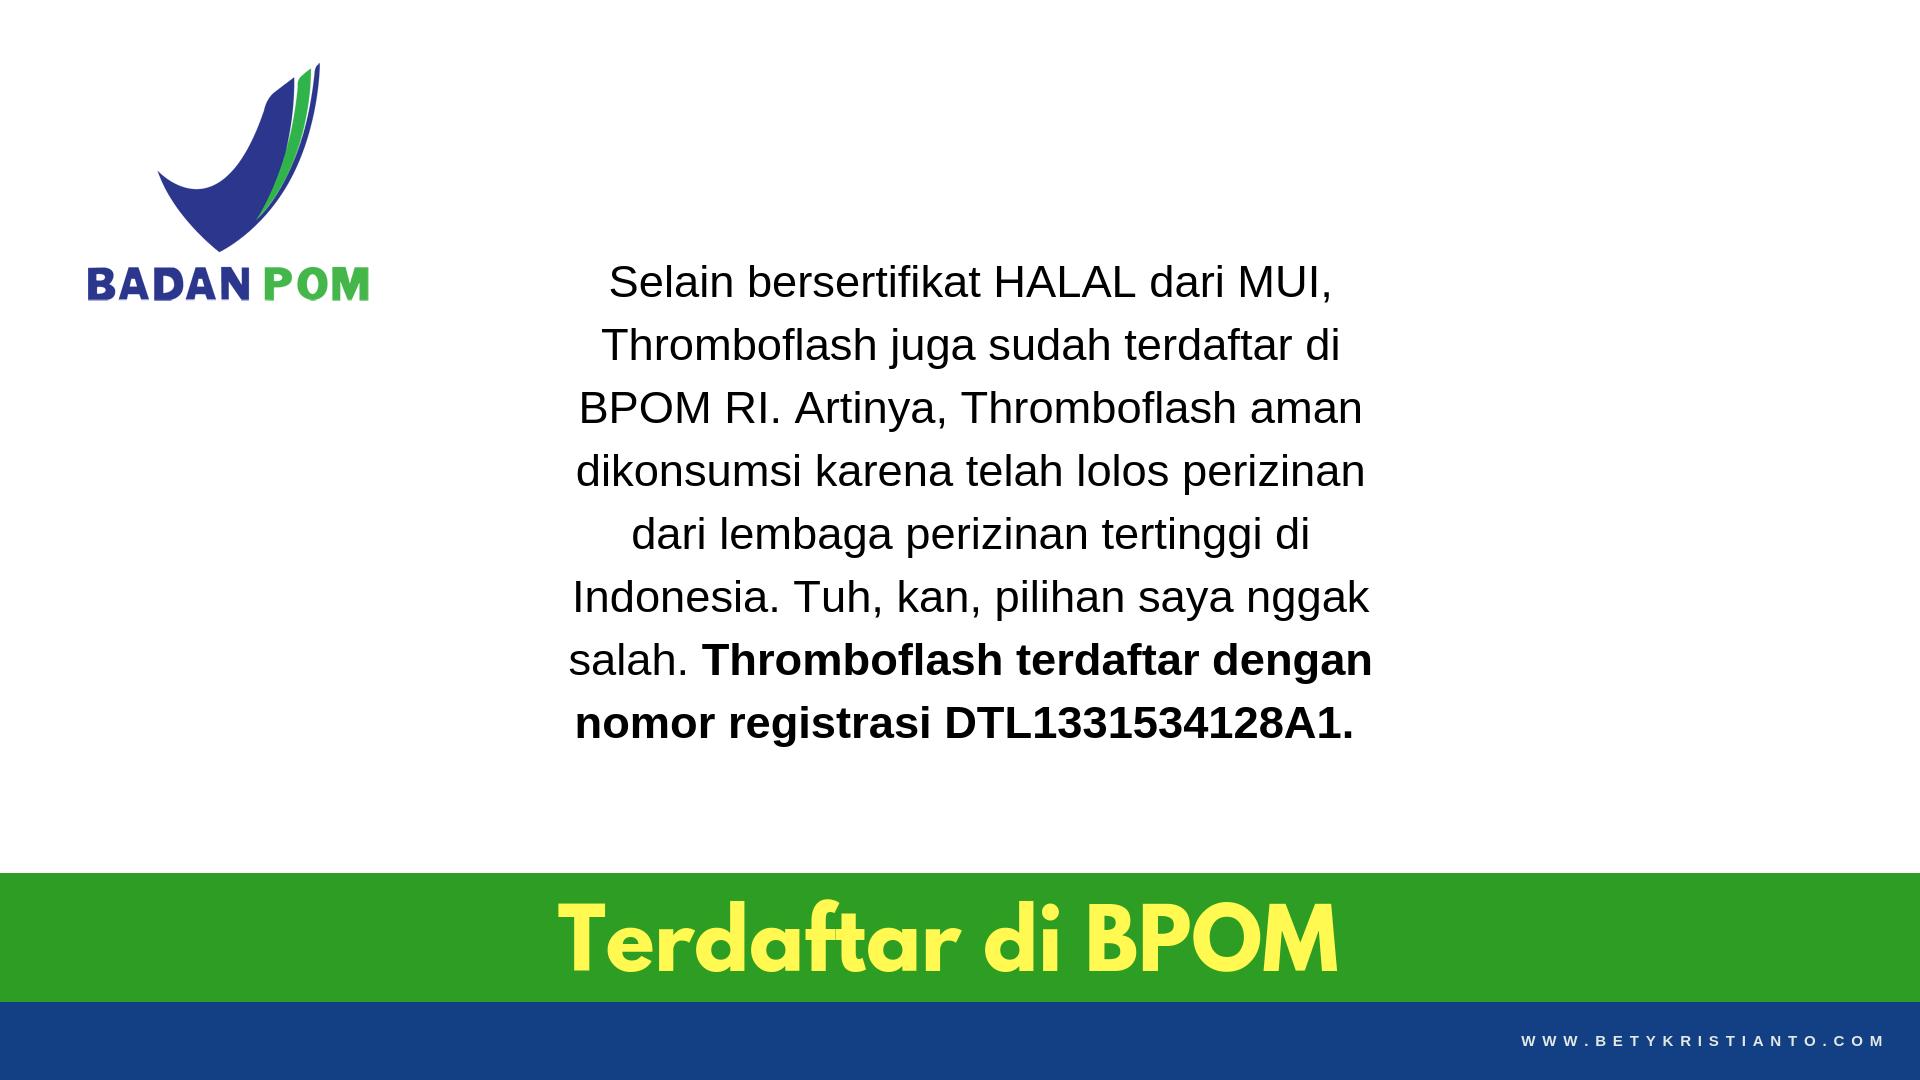 Thromboflash BPOM